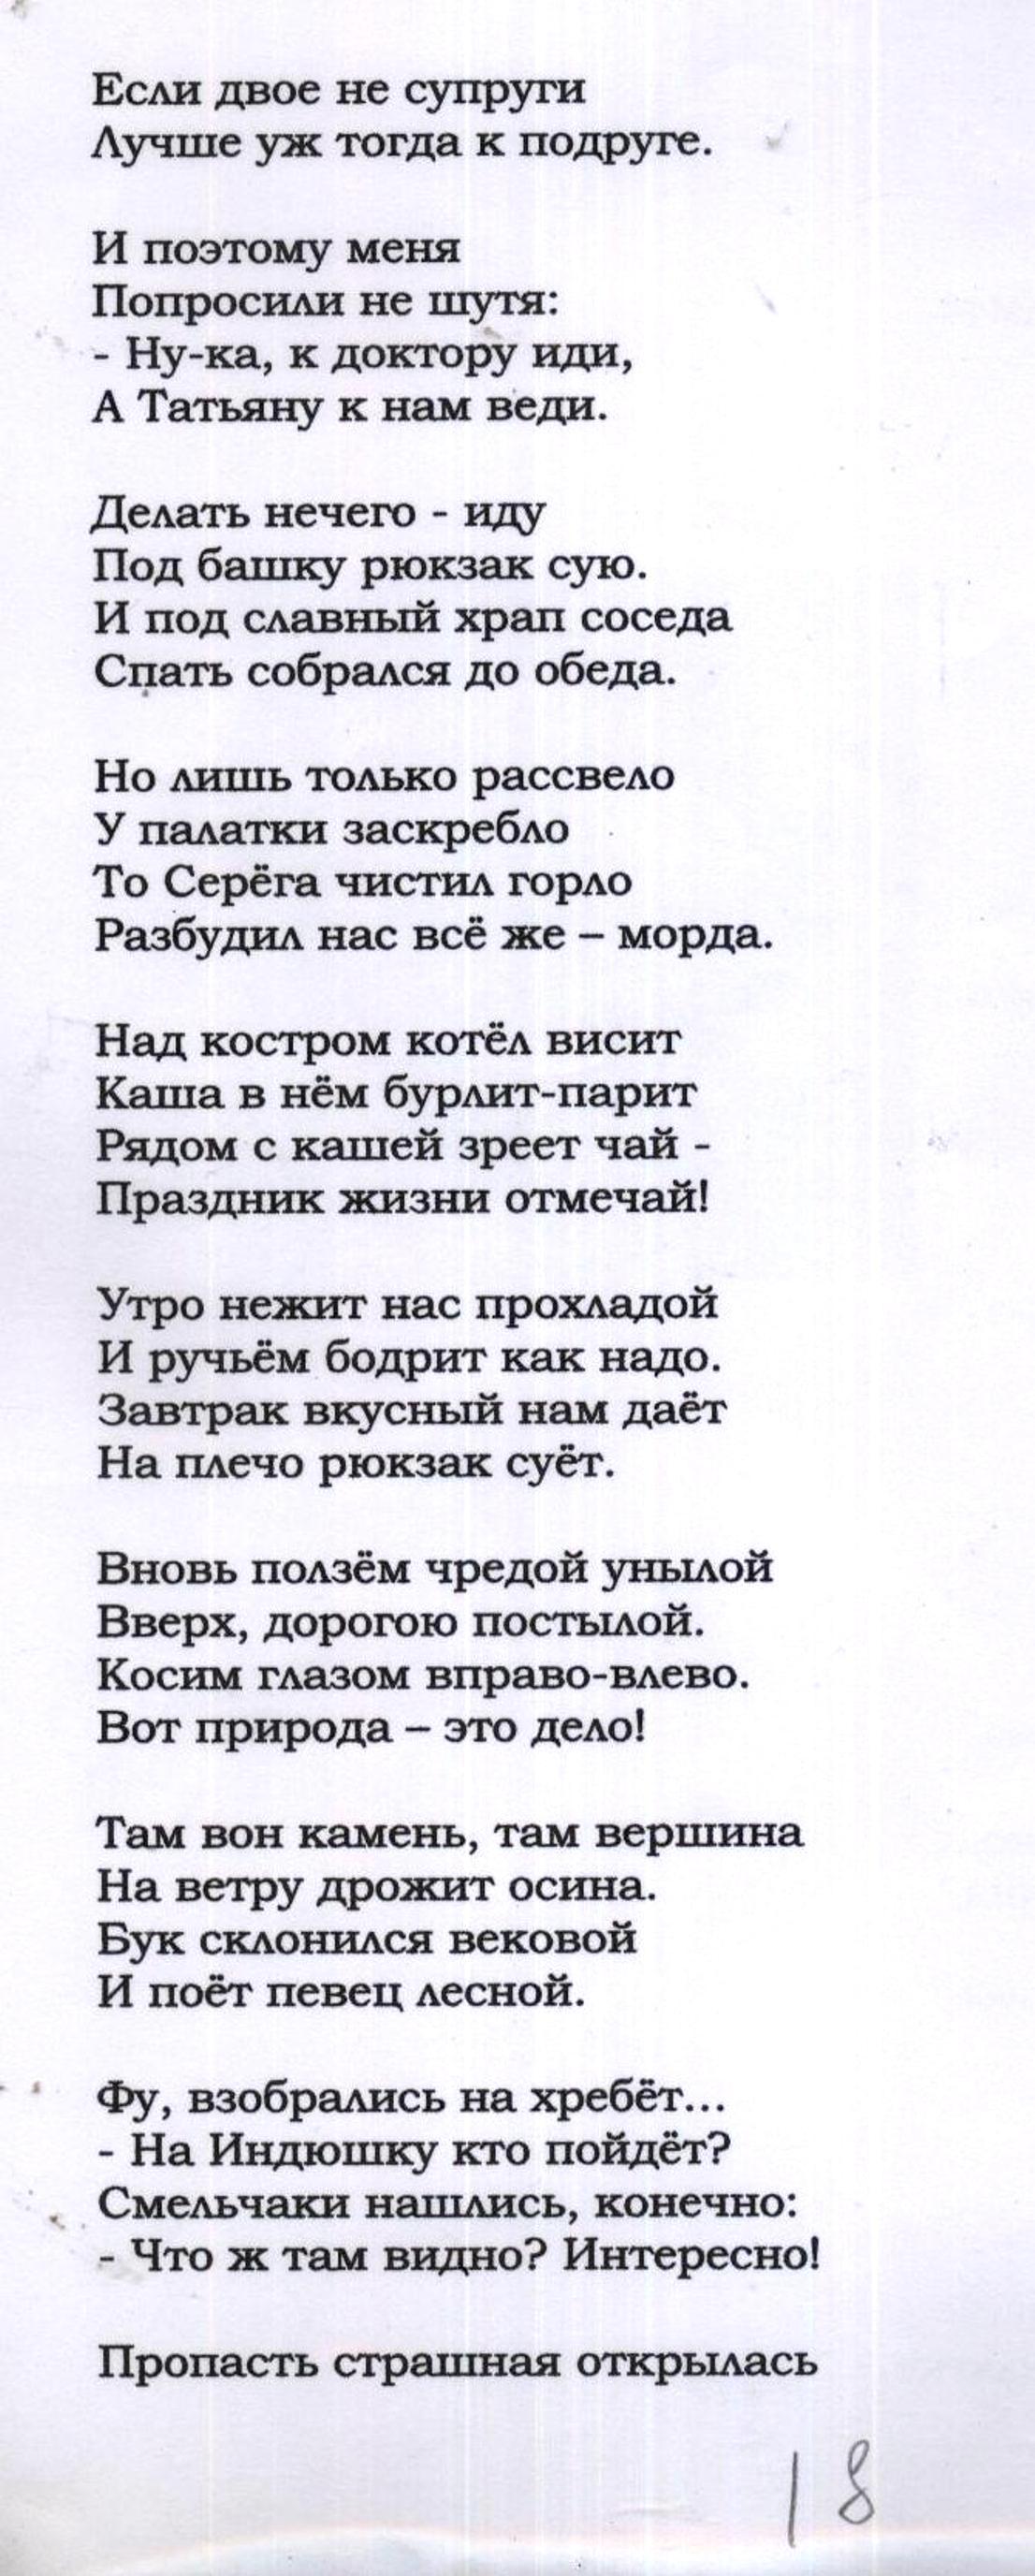 Стихи 017.jpg